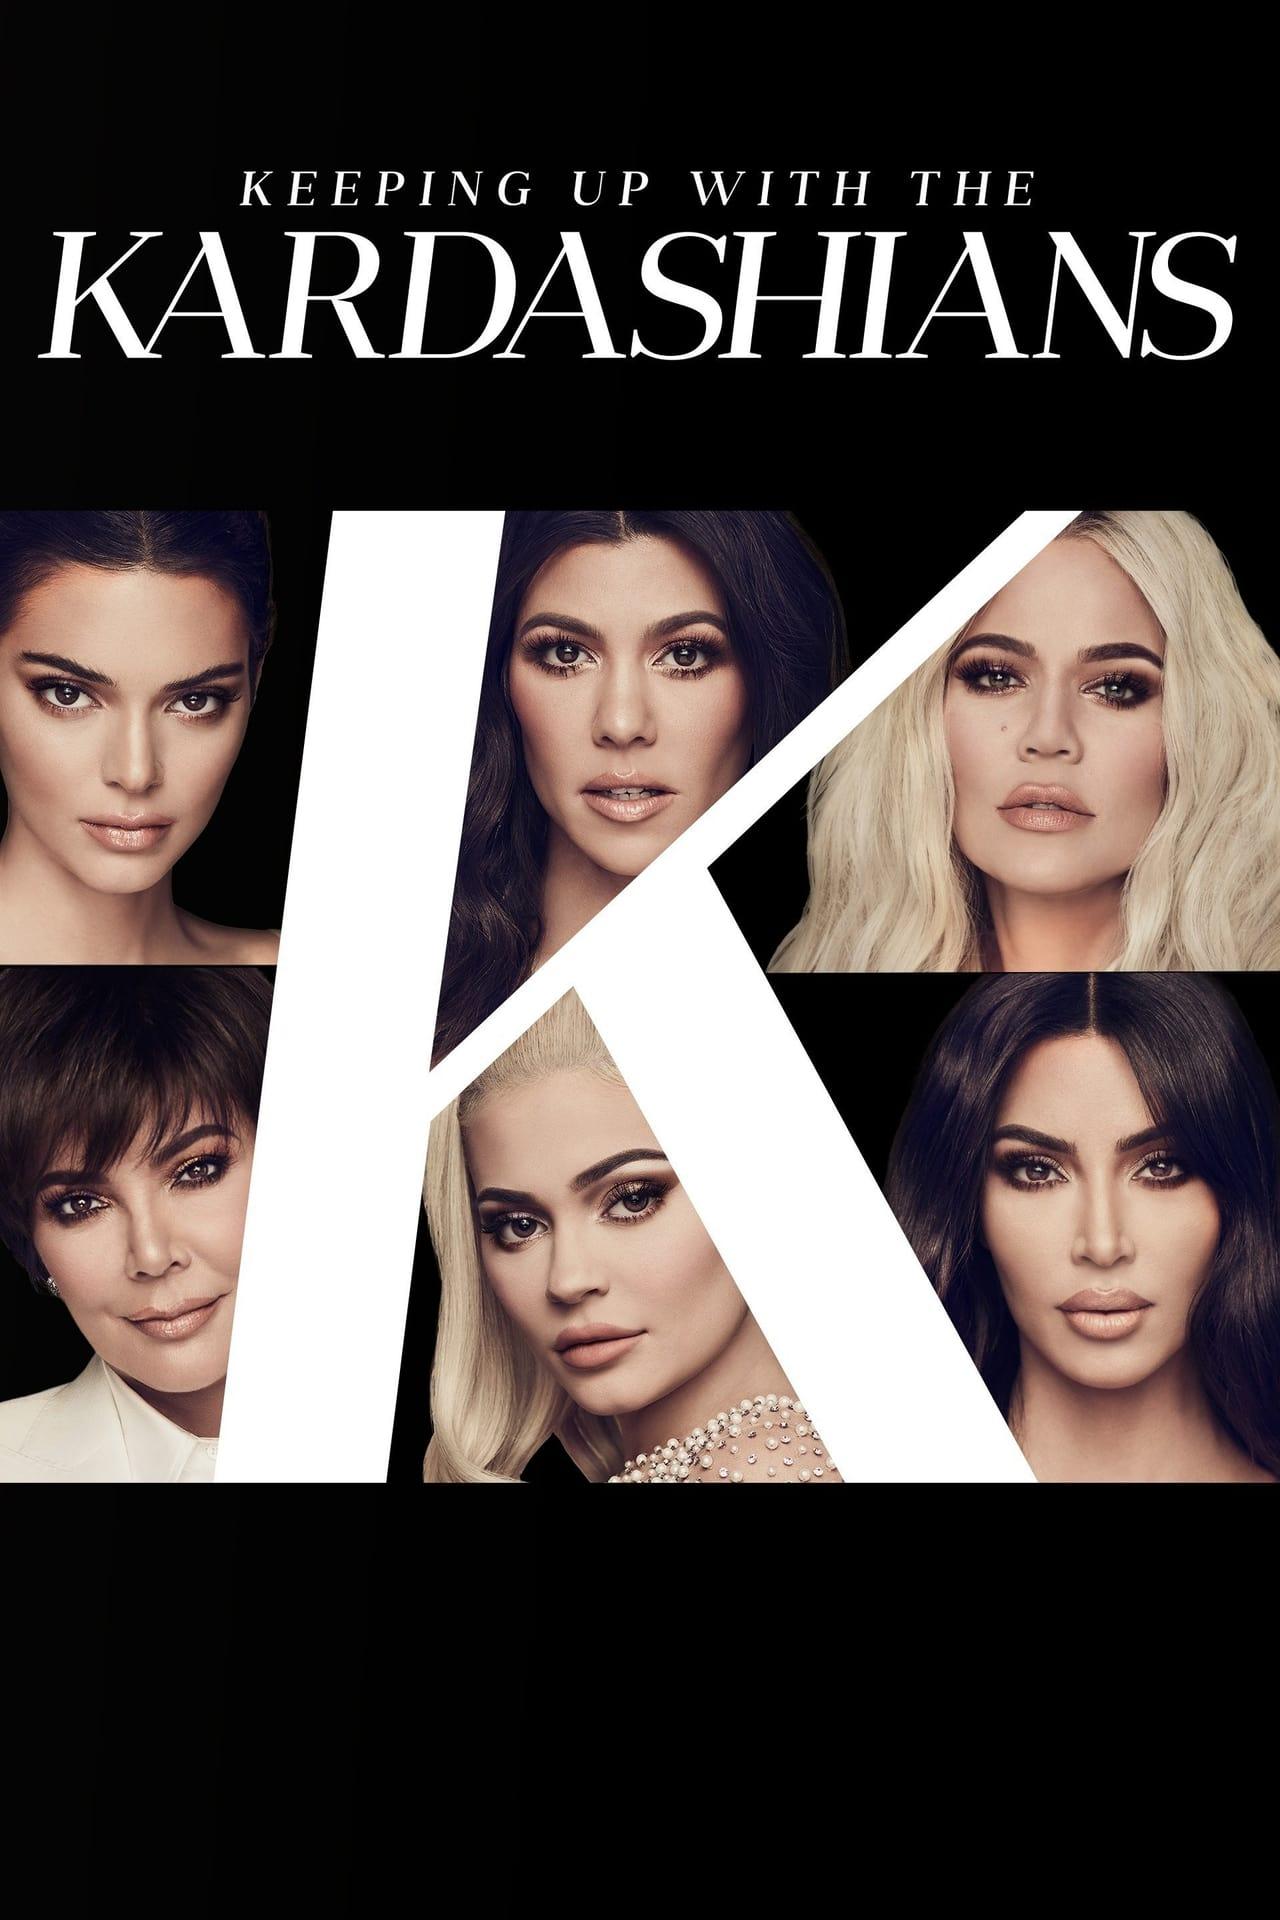 Keeping Up With The Kardashians Season 18